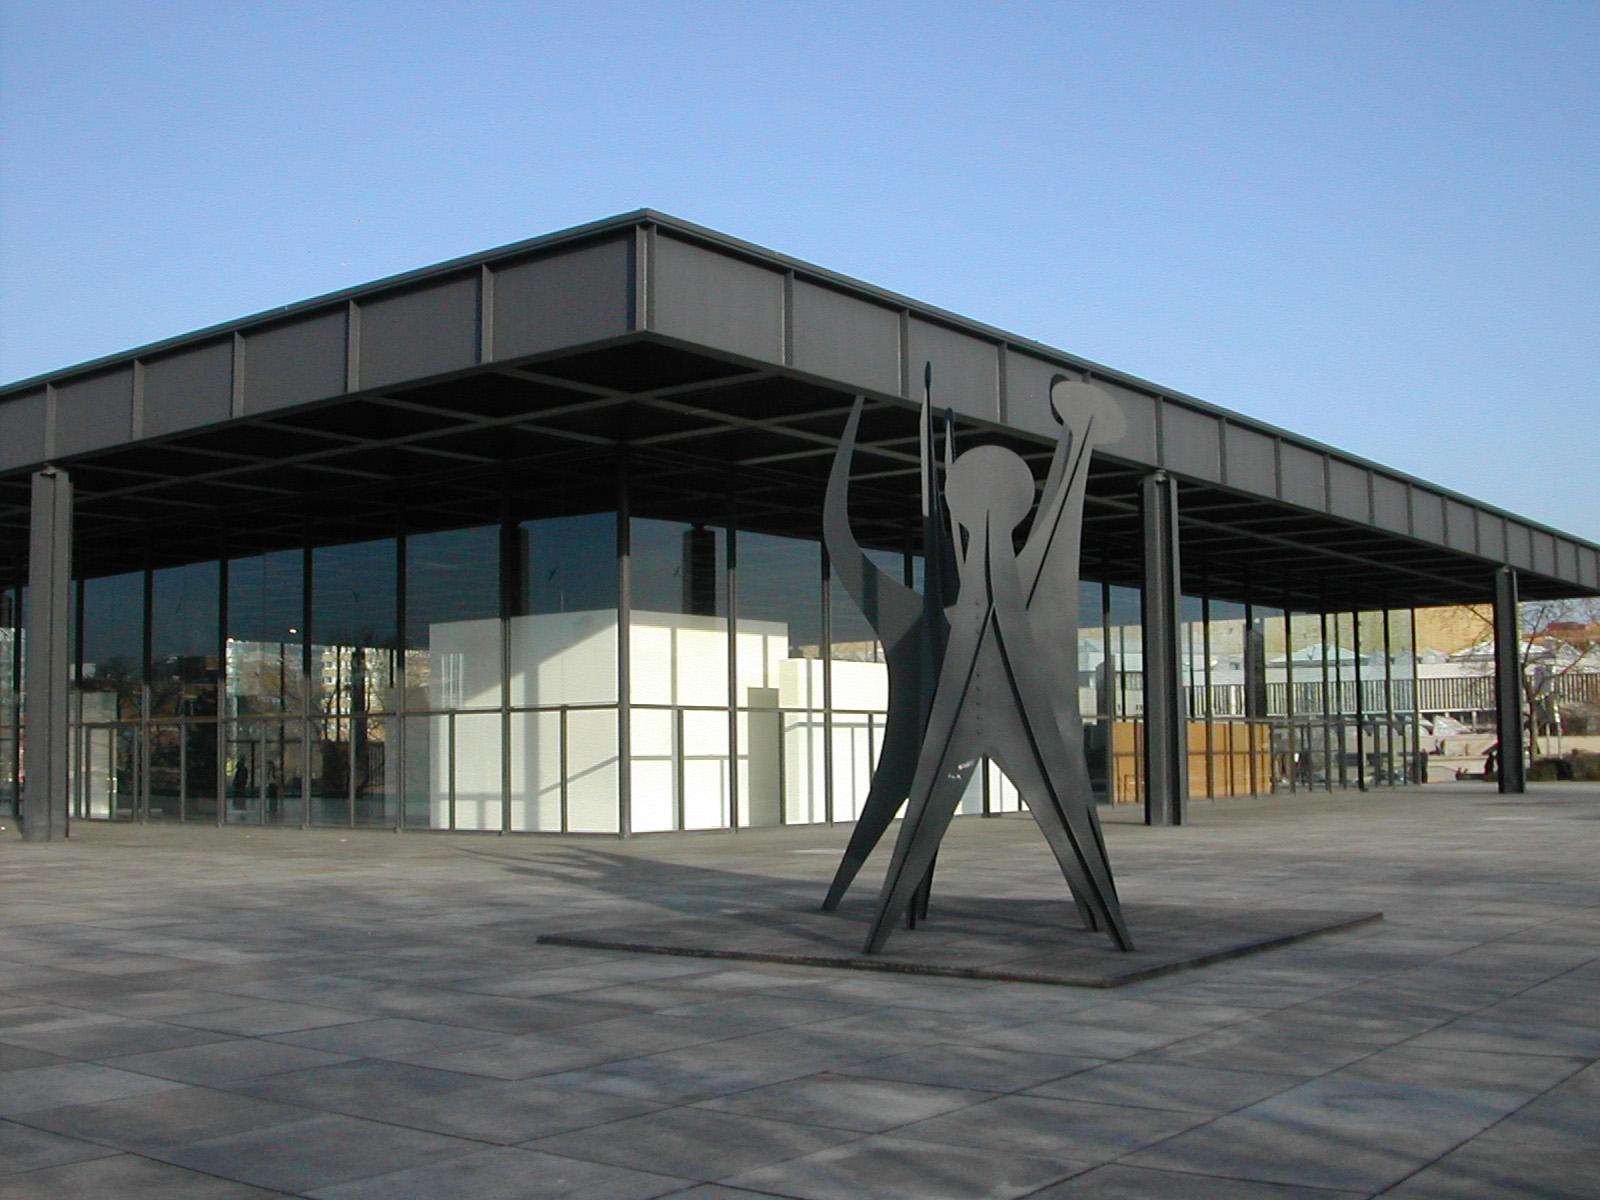 Neue Nationalgalerie | © User:Harald Kliems/WikiCommons